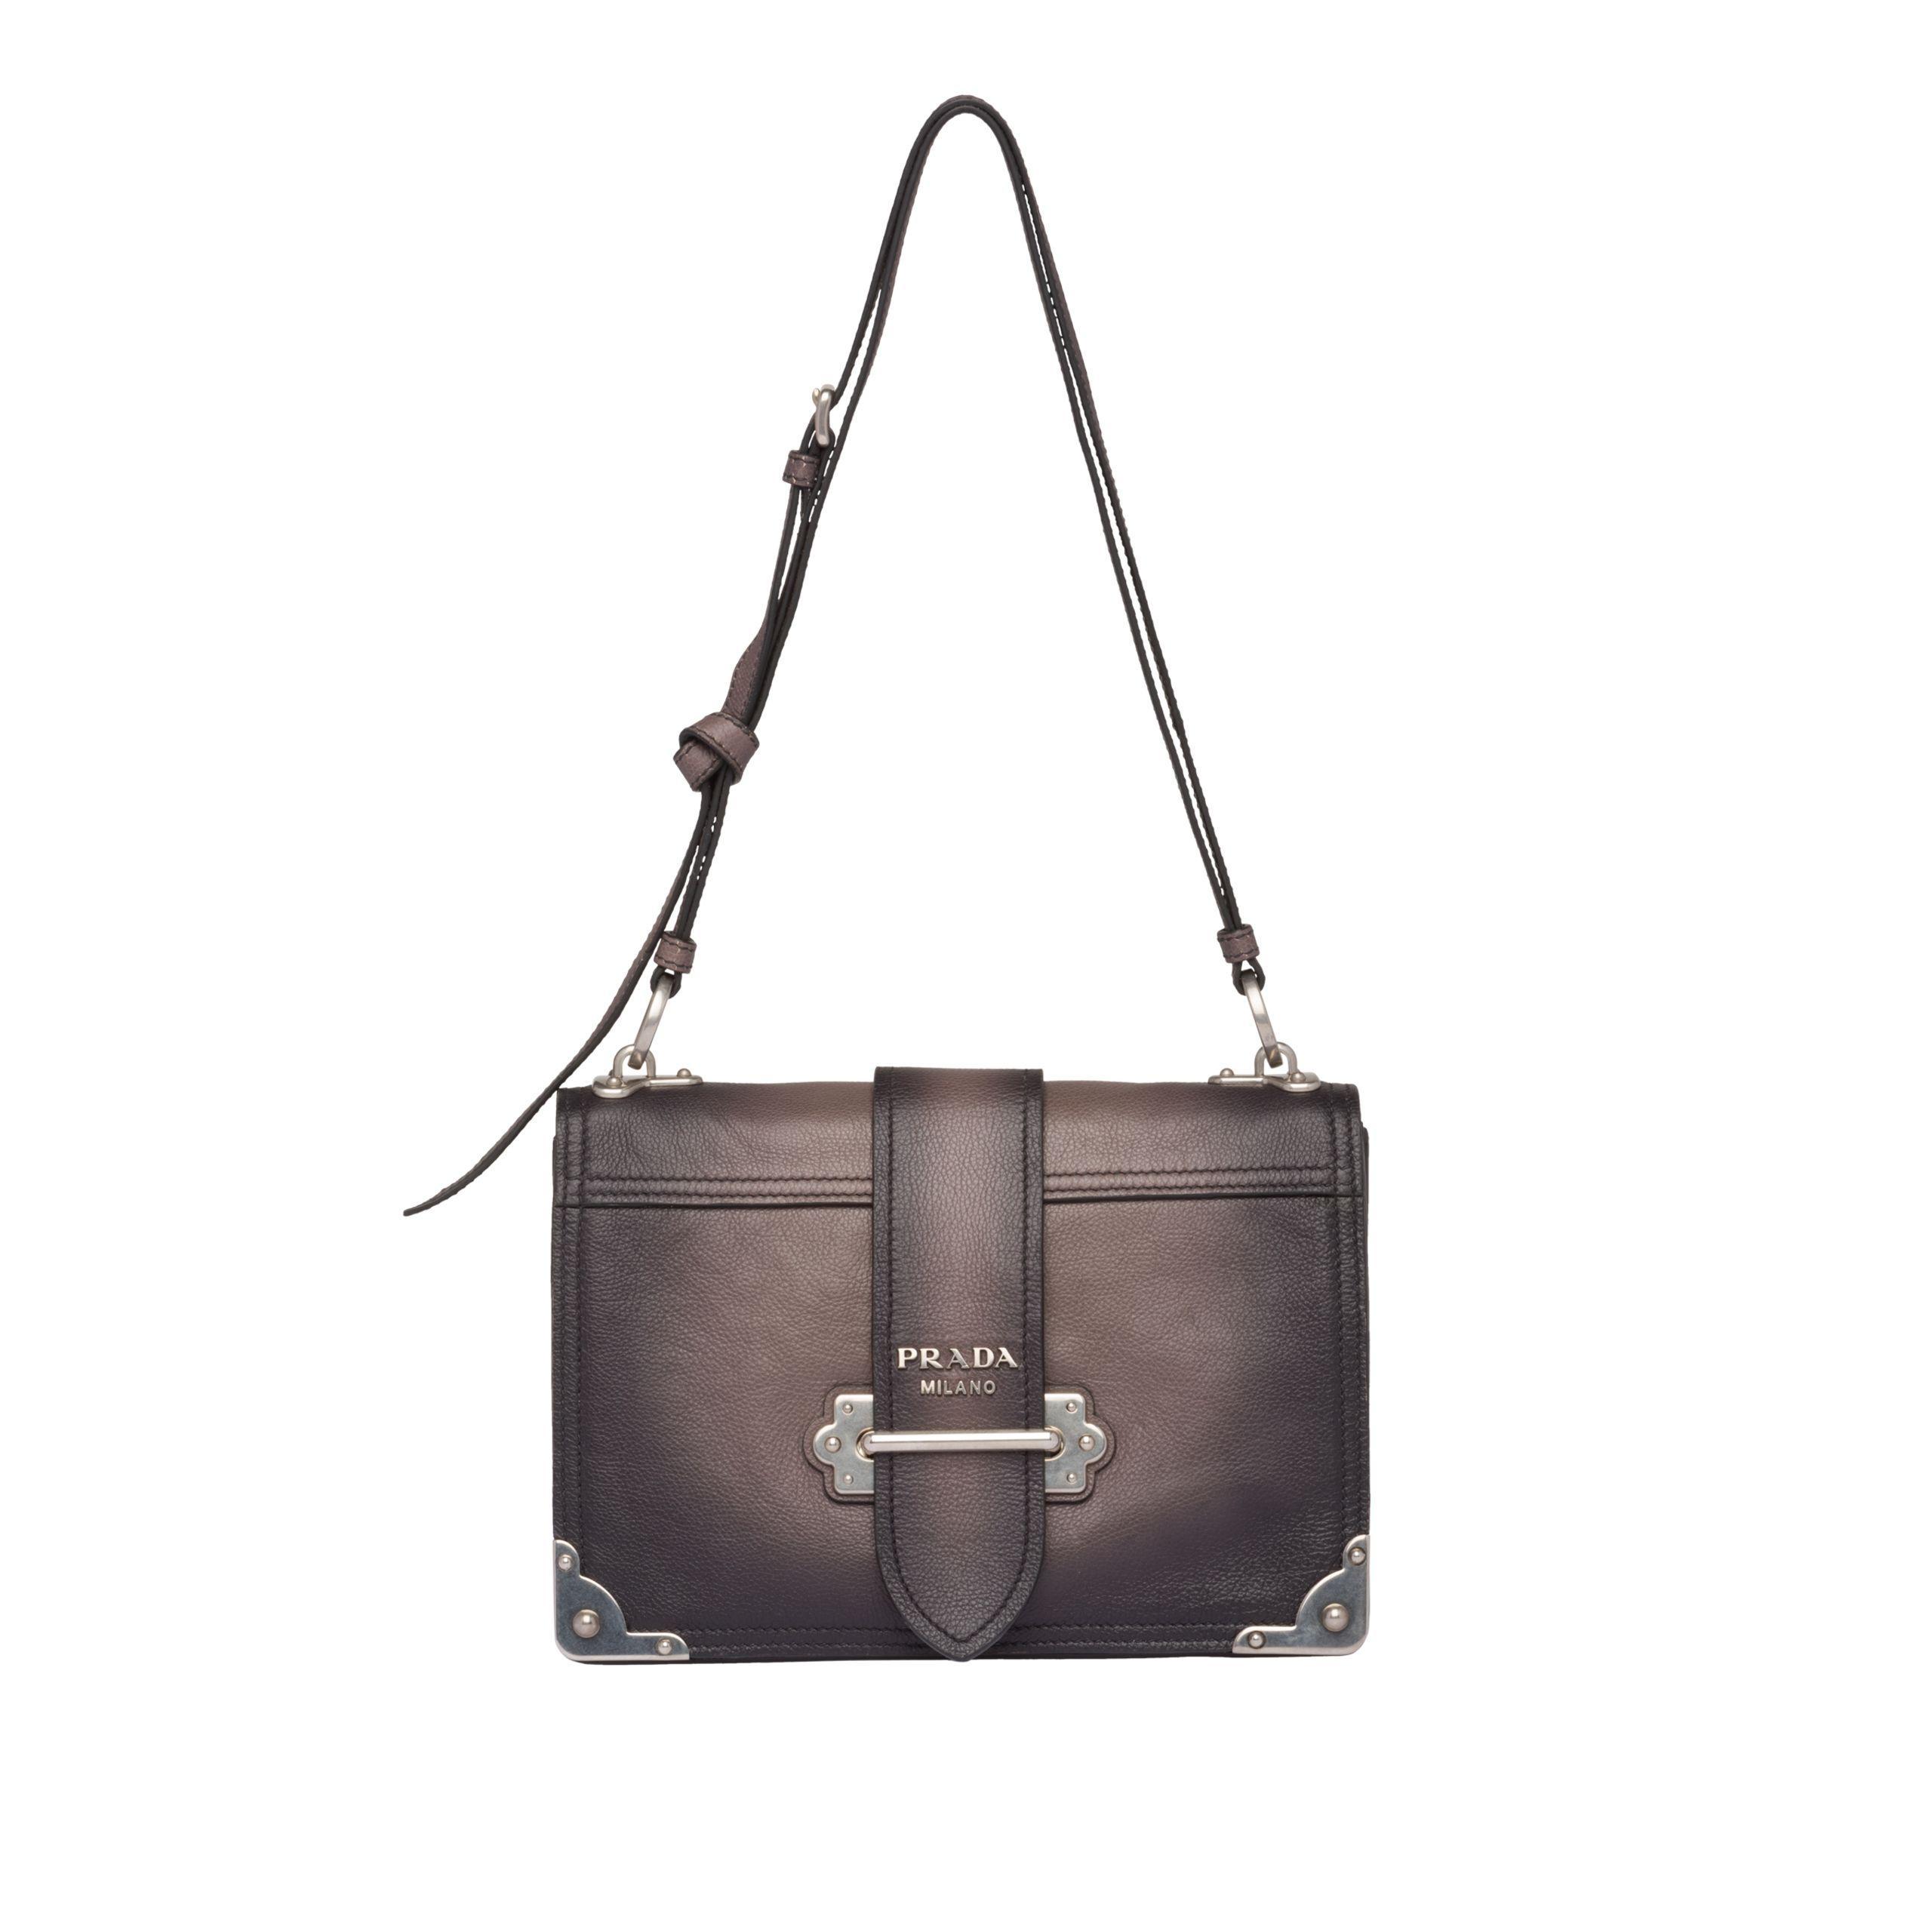 53e5a4c9347a Prada - Multicolor Cahier Leather Shoulder Bag - Lyst